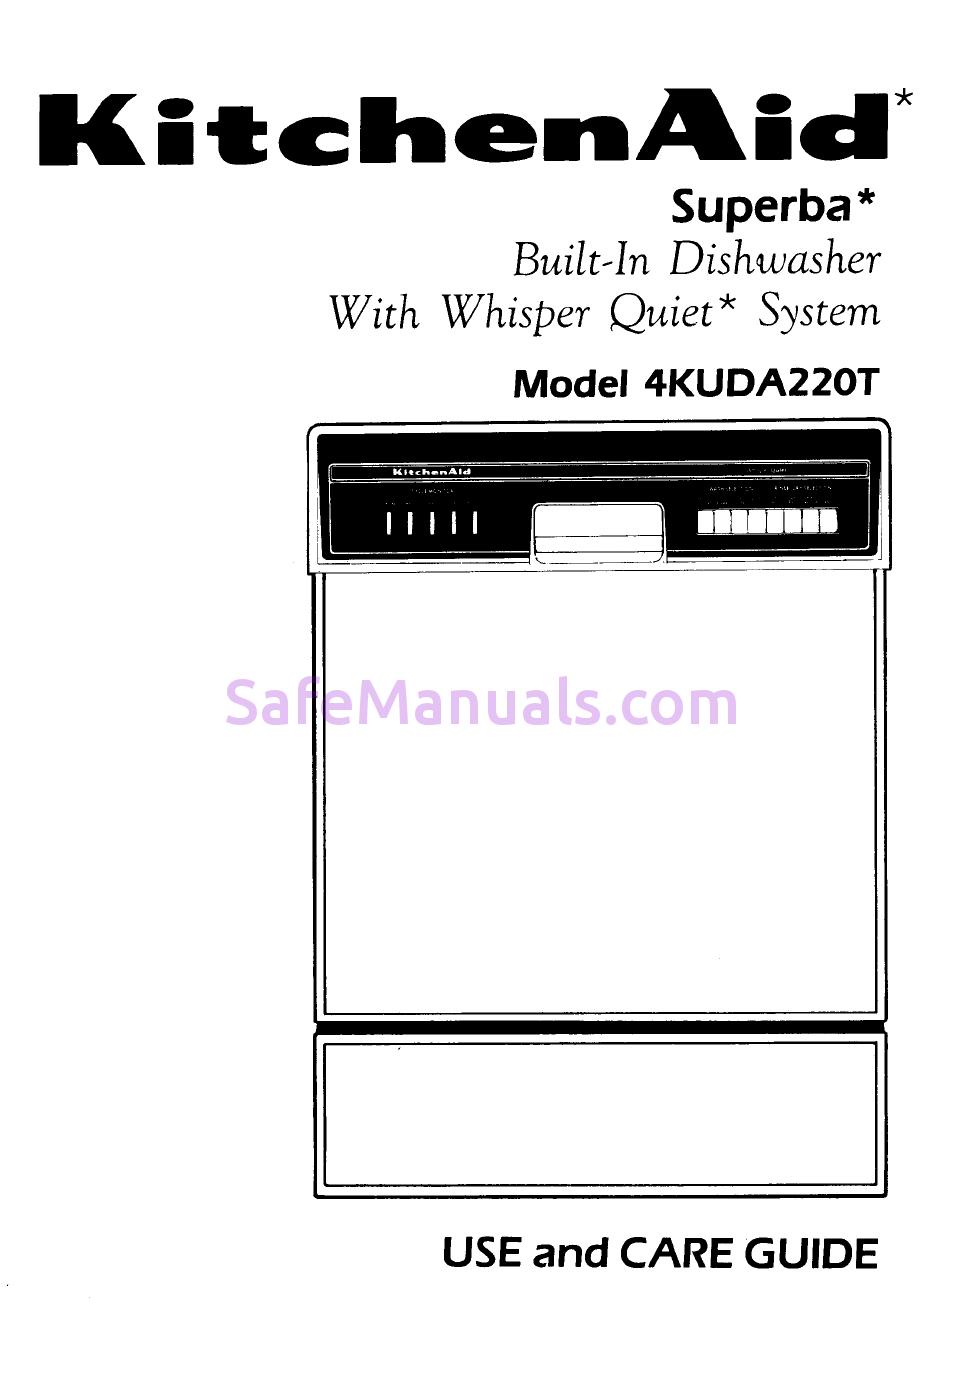 Kitchenaid 4kuda22ot User Manual Kitchen Aid User Manual Built In Dishwasher